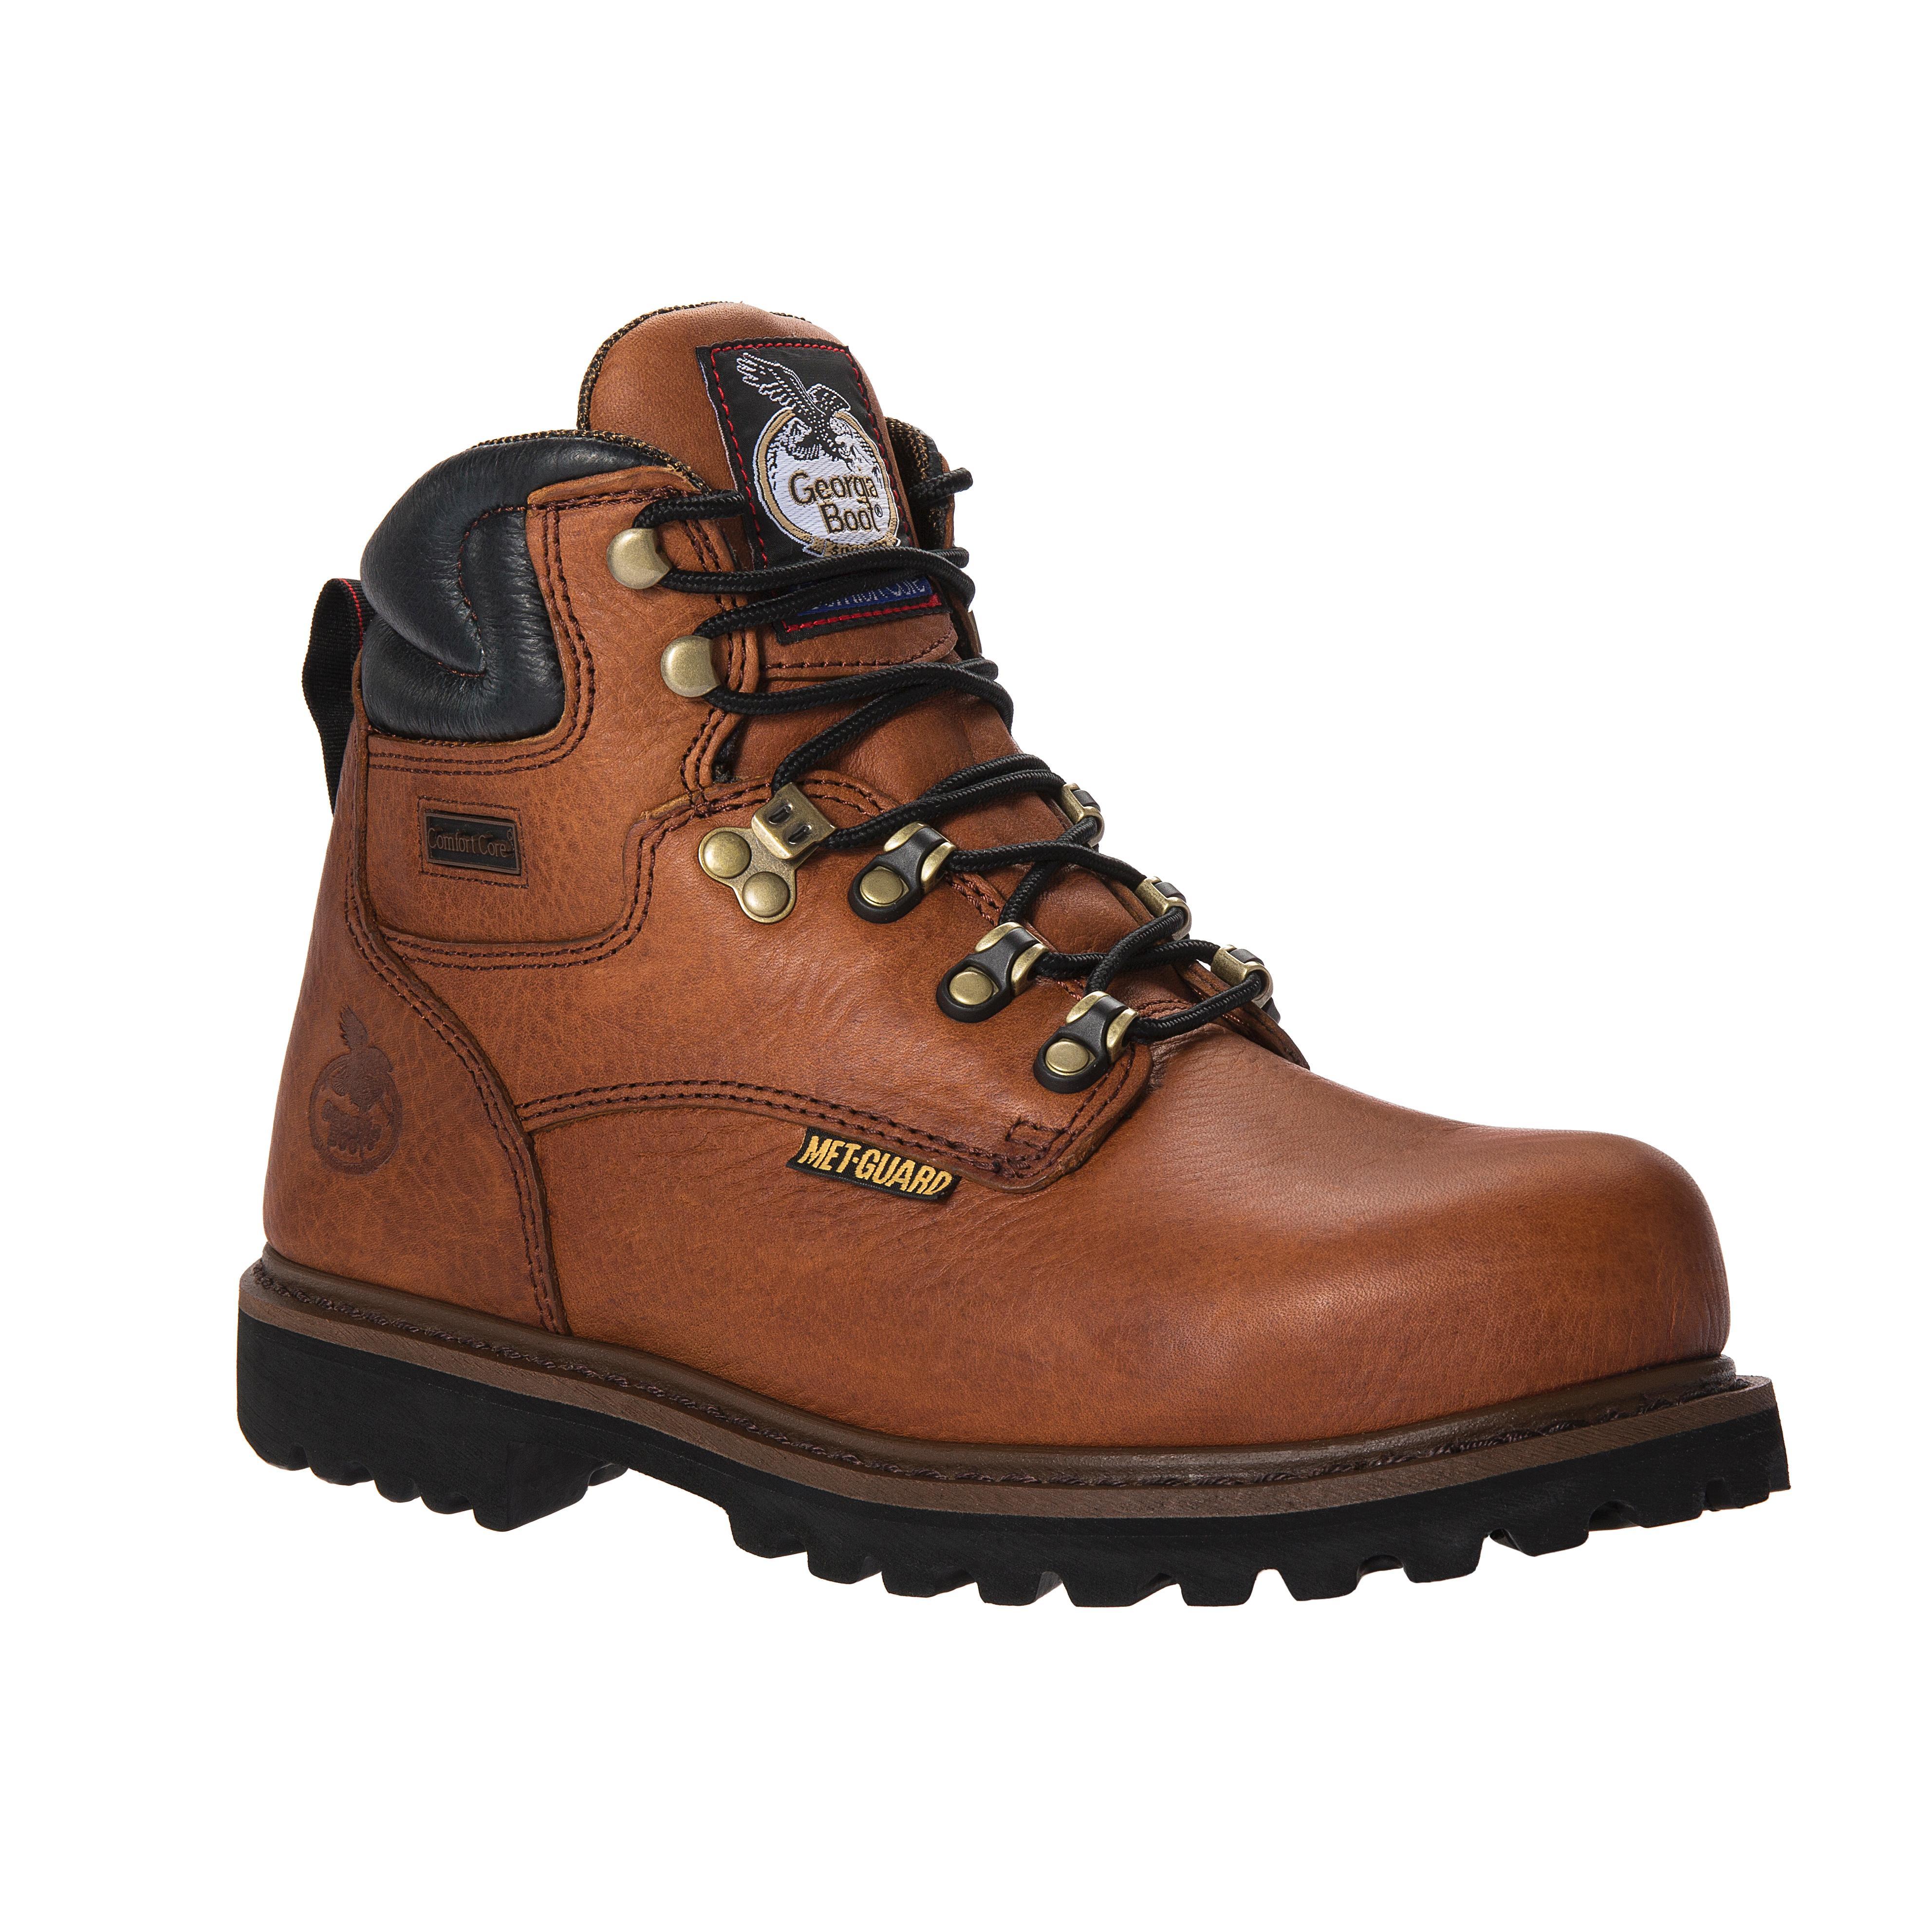 toe comfortable boots the most work market in steel comforter